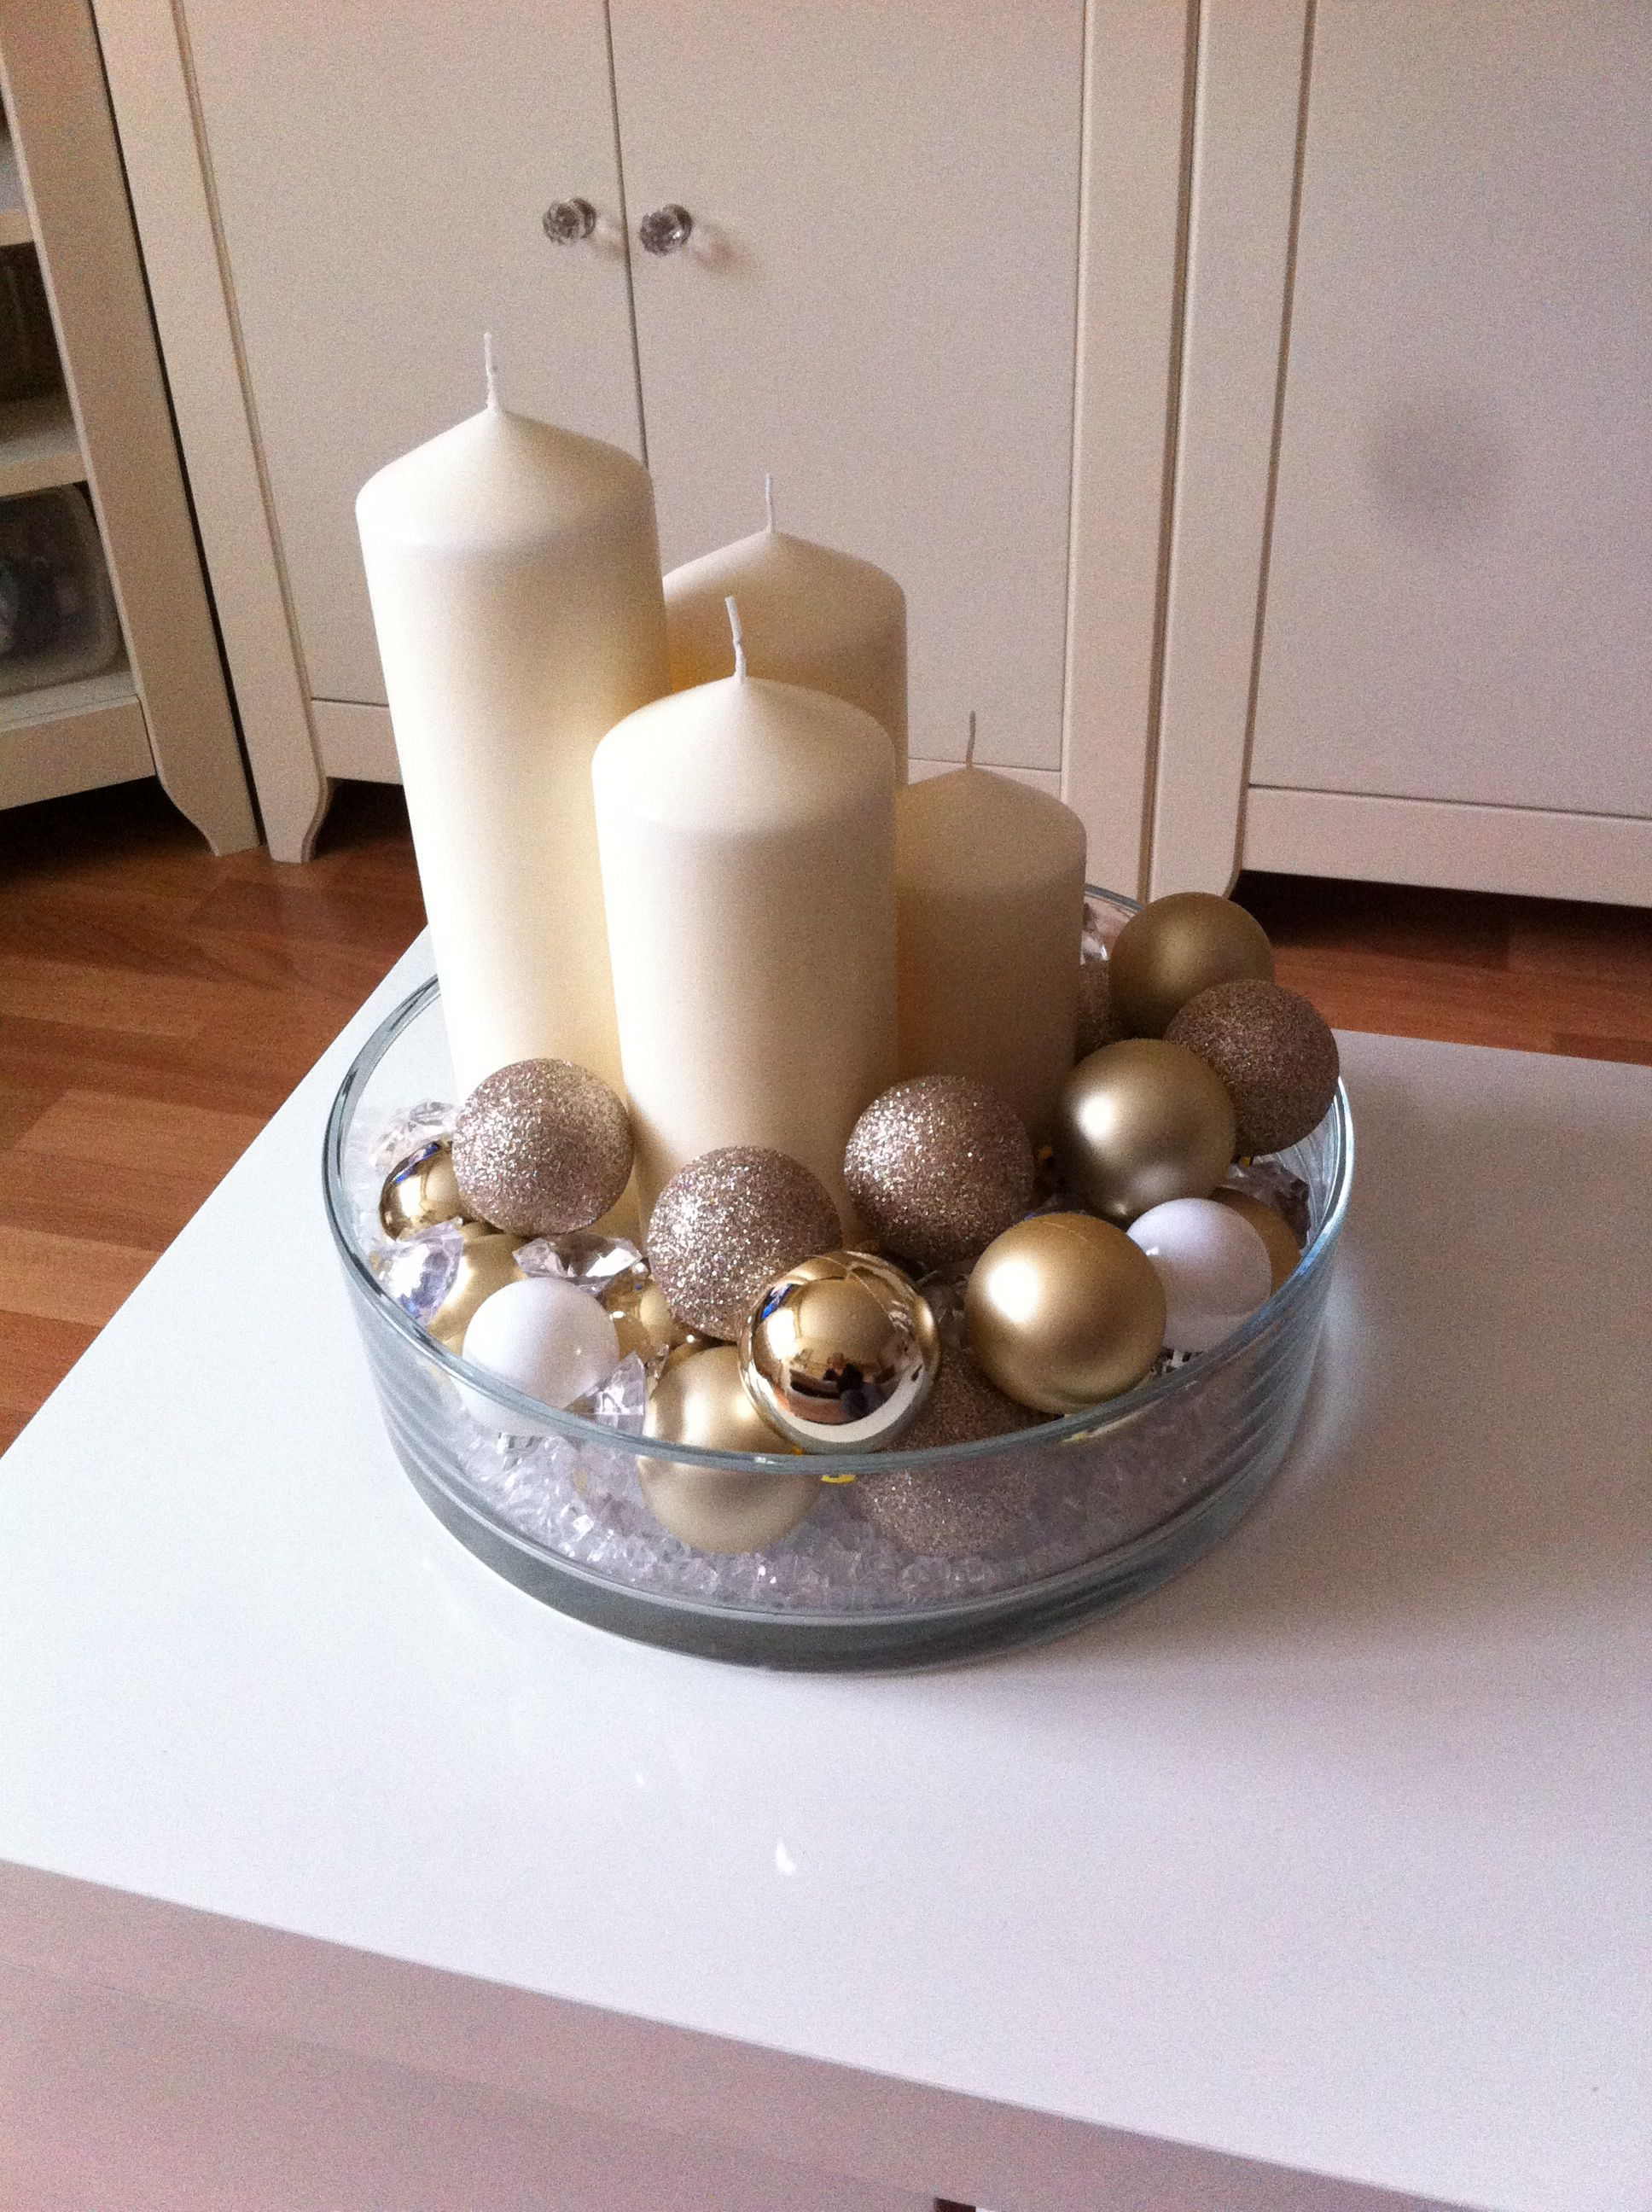 mein adventskranz beige gold weiss mis manualidades pinterest jul dekoration och. Black Bedroom Furniture Sets. Home Design Ideas